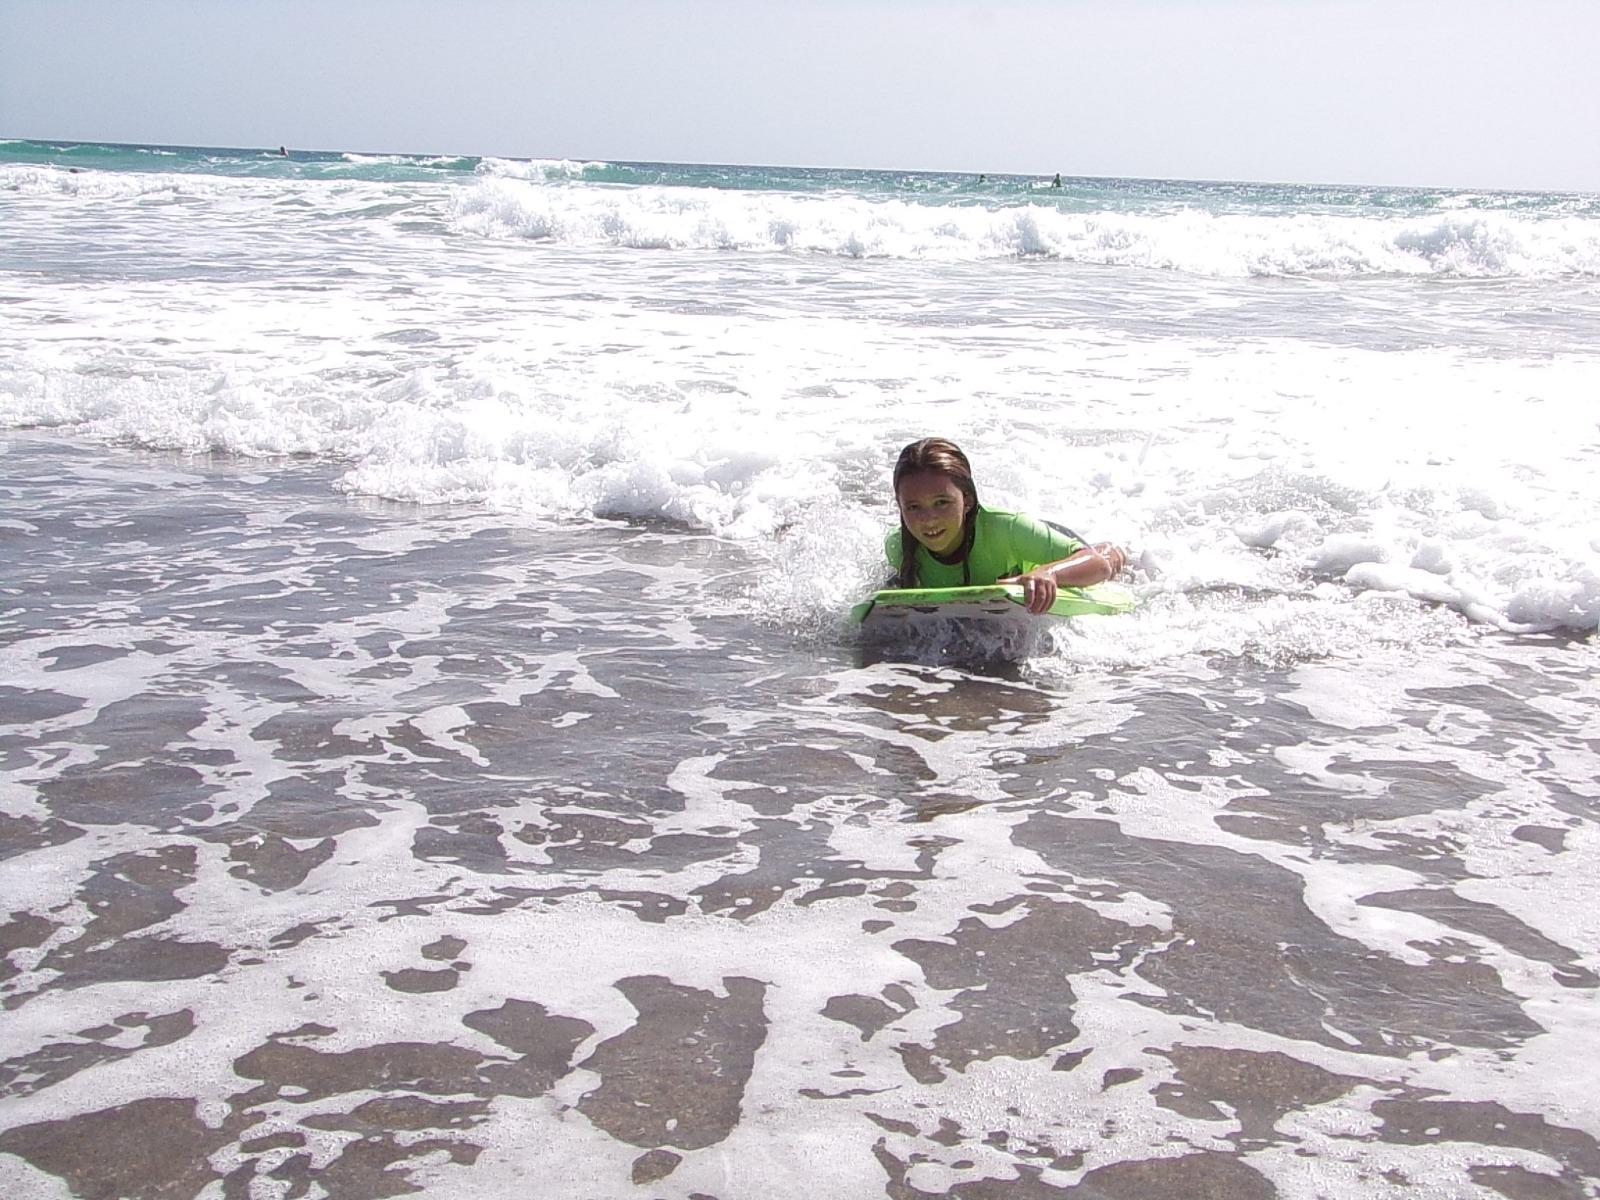 VERANO 2019 2 FUERTE TRIBU SURFWhatsApp Image 2019-08-15 at 16.21.41.jpeg